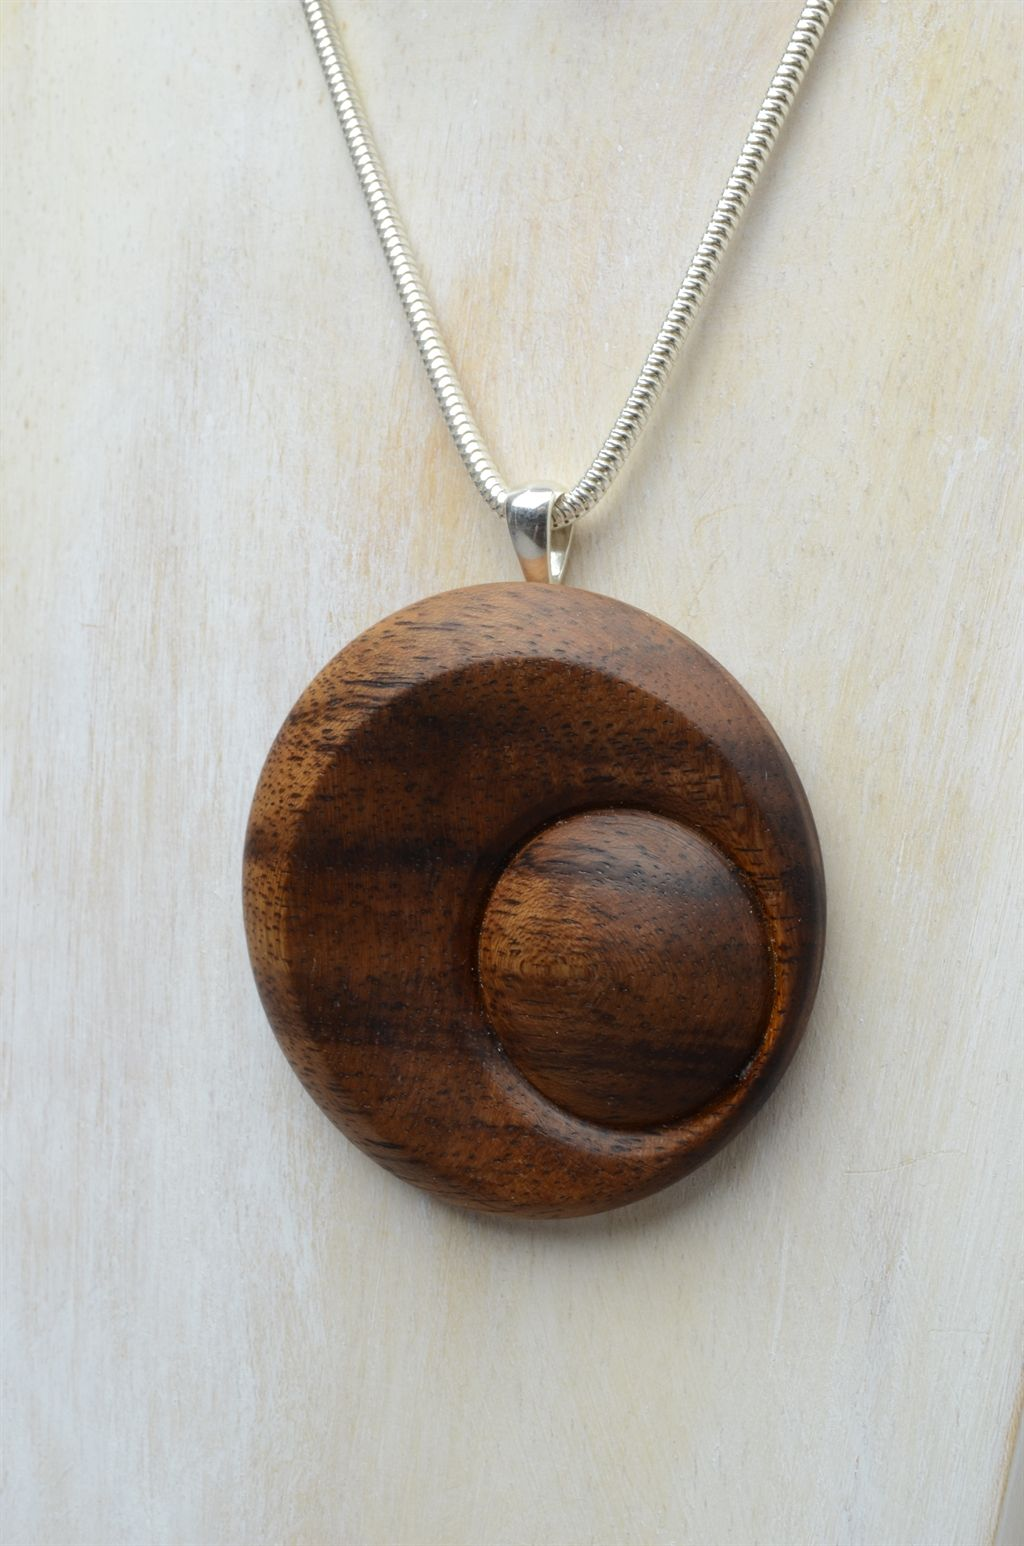 Genuine Koa Wood Hawaiian Jewelry Spiral Pendant Choker//Necklace  # 45023